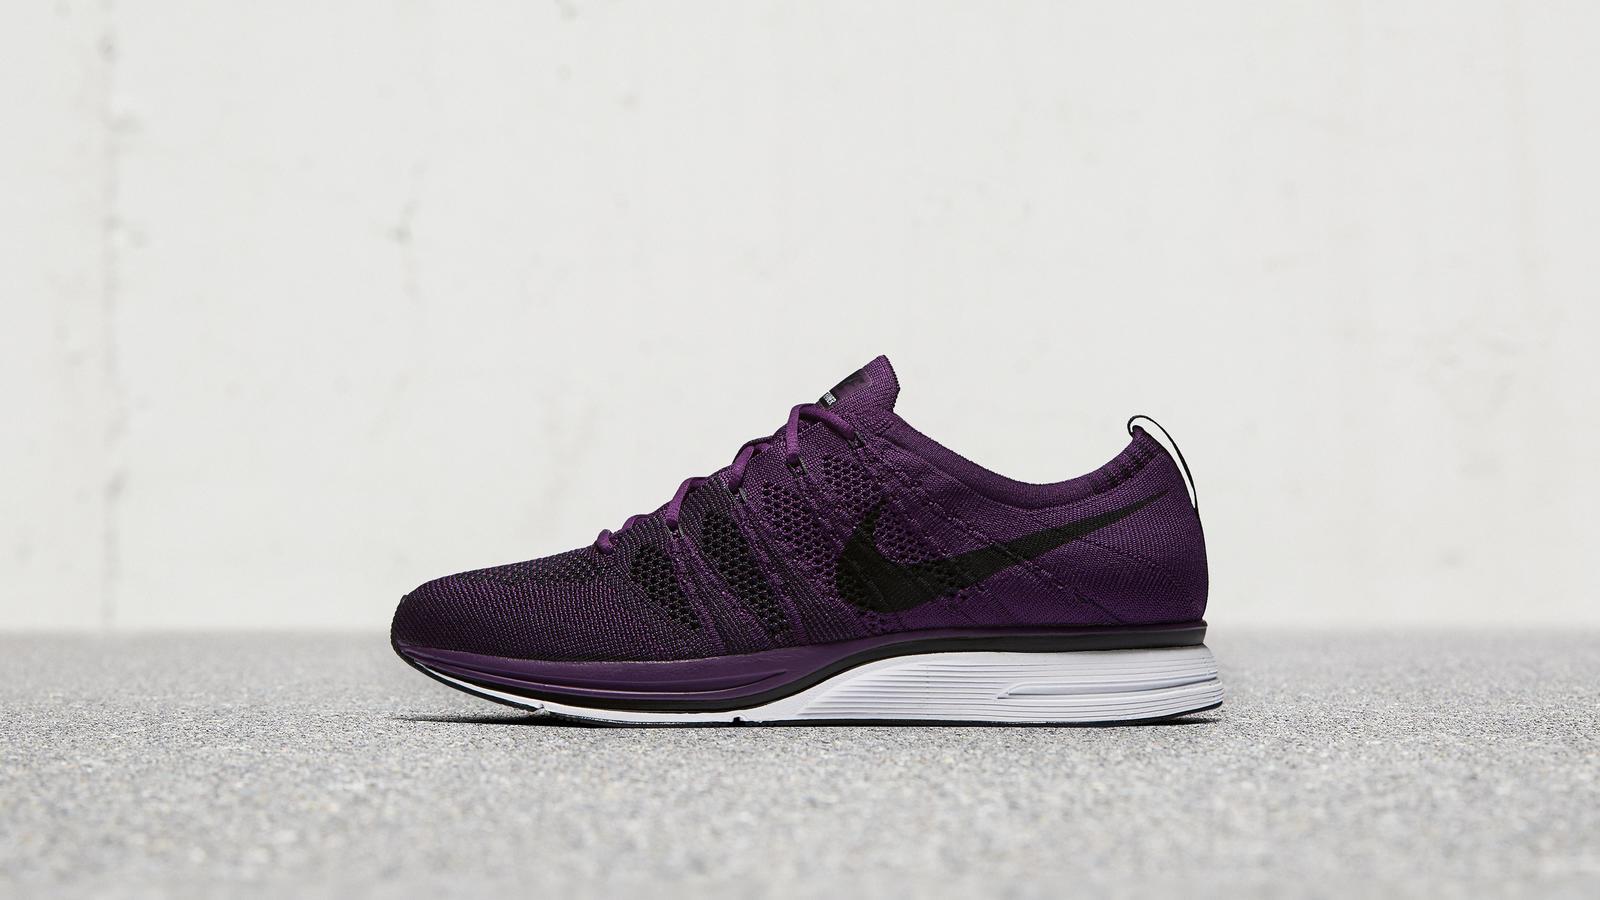 e107b2440b23 Nike Flyknit Trainer - Nike News